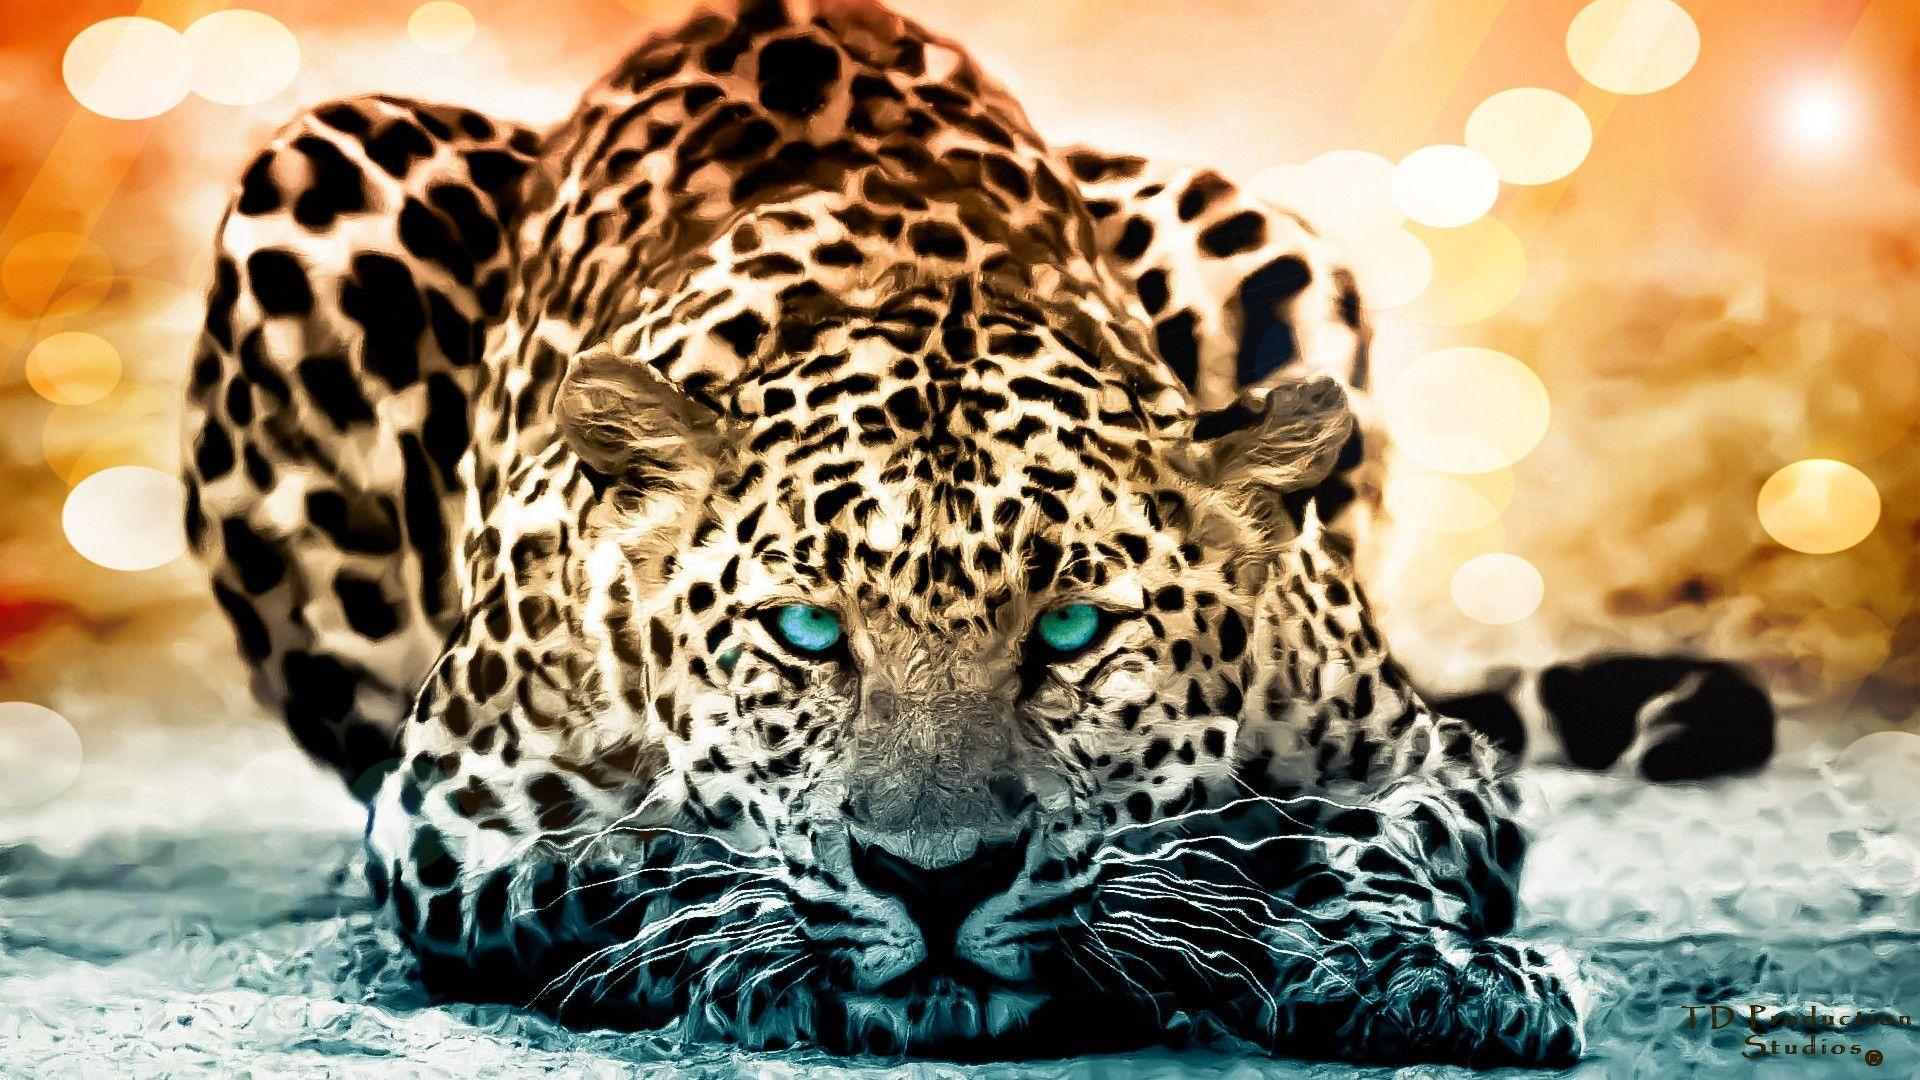 188 Jaguar HD Wallpapers | Backgrounds - Wallpaper Abyss